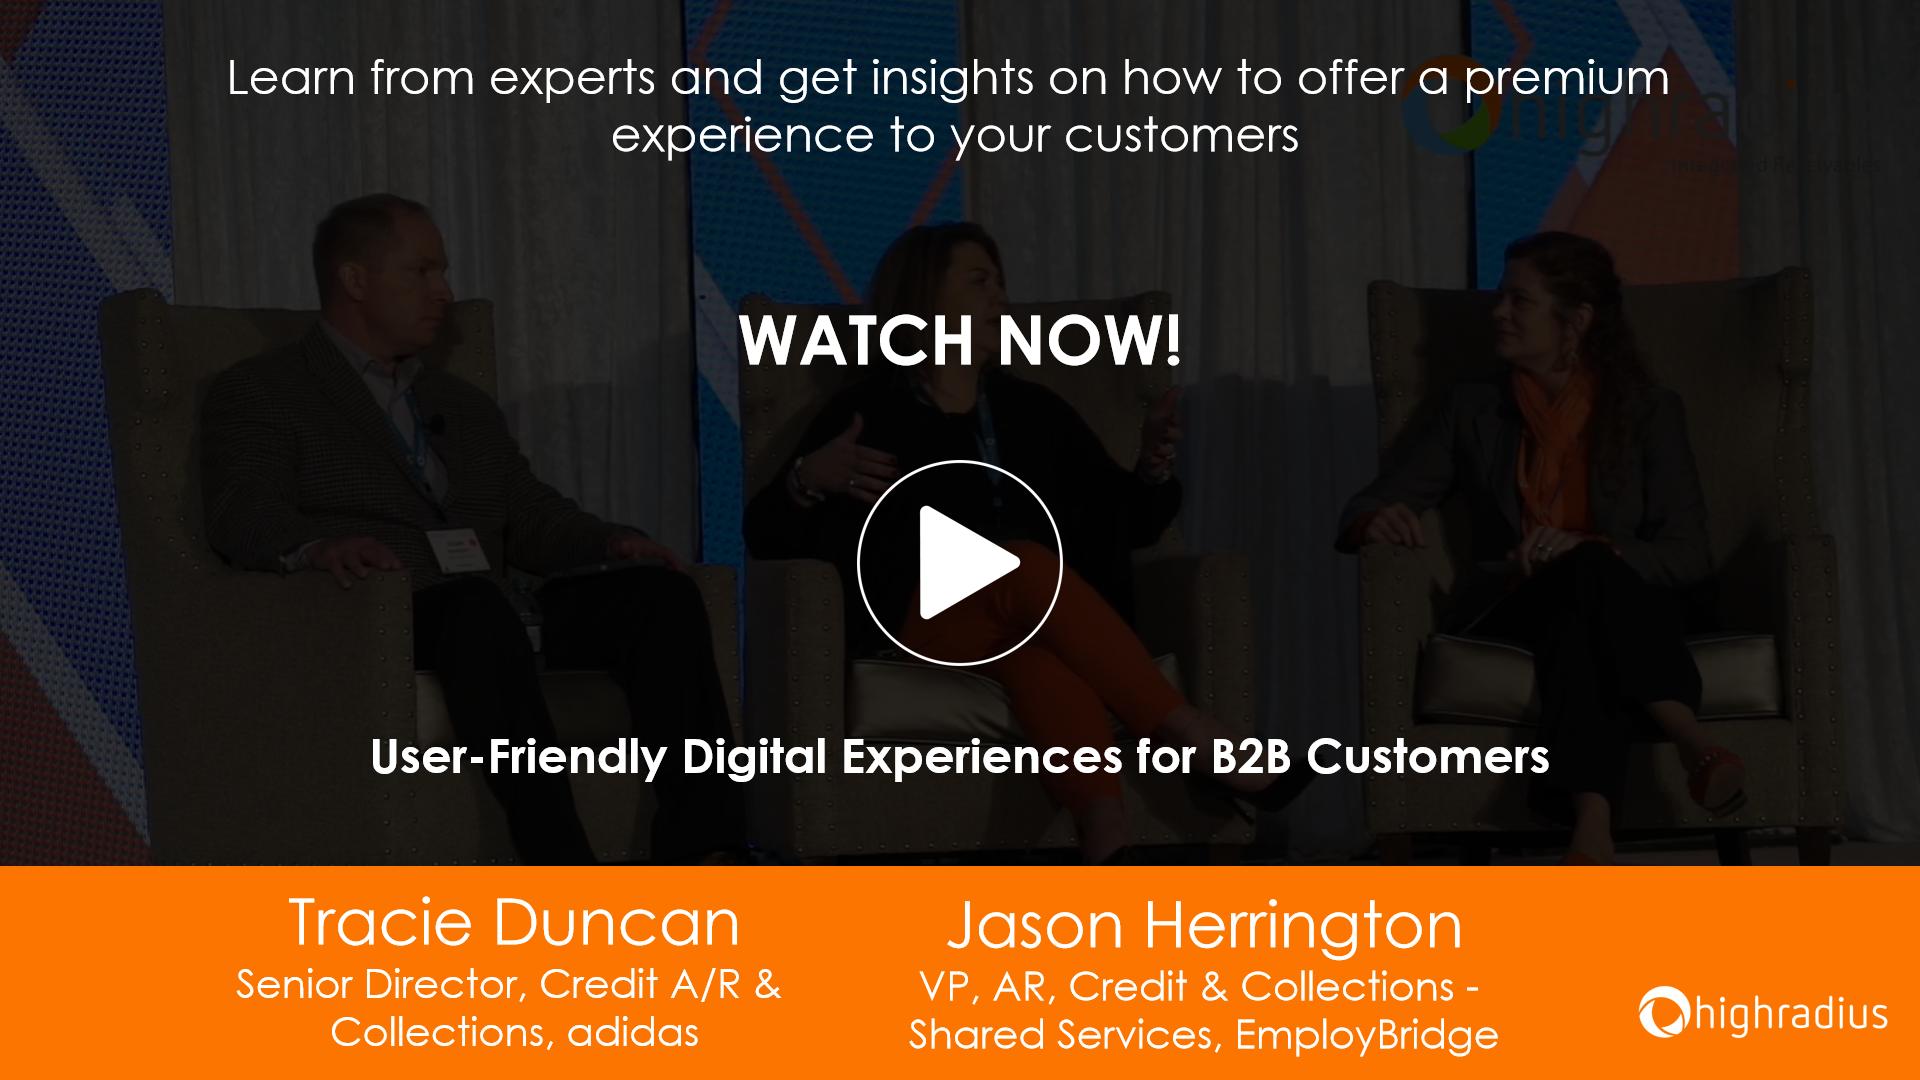 User-Friendly Digital Experiences for B2B Customers